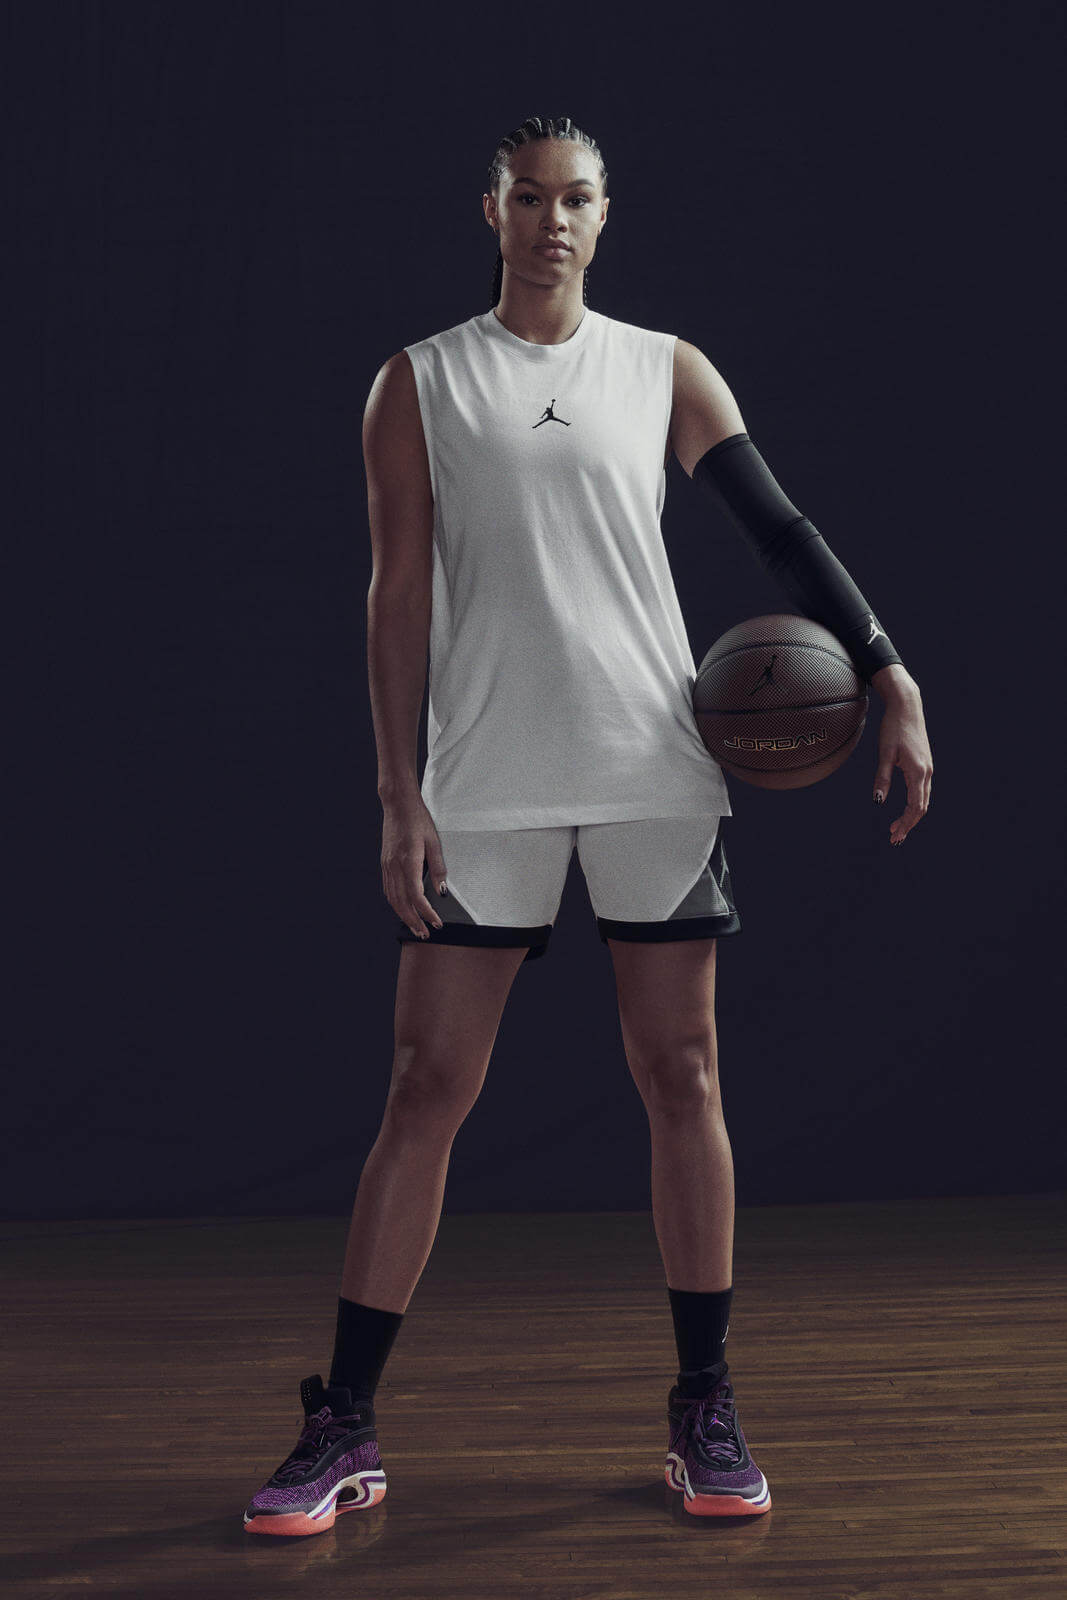 Satou Sabally im Nike Air Jordan 36 XXXVI - First Light colorway